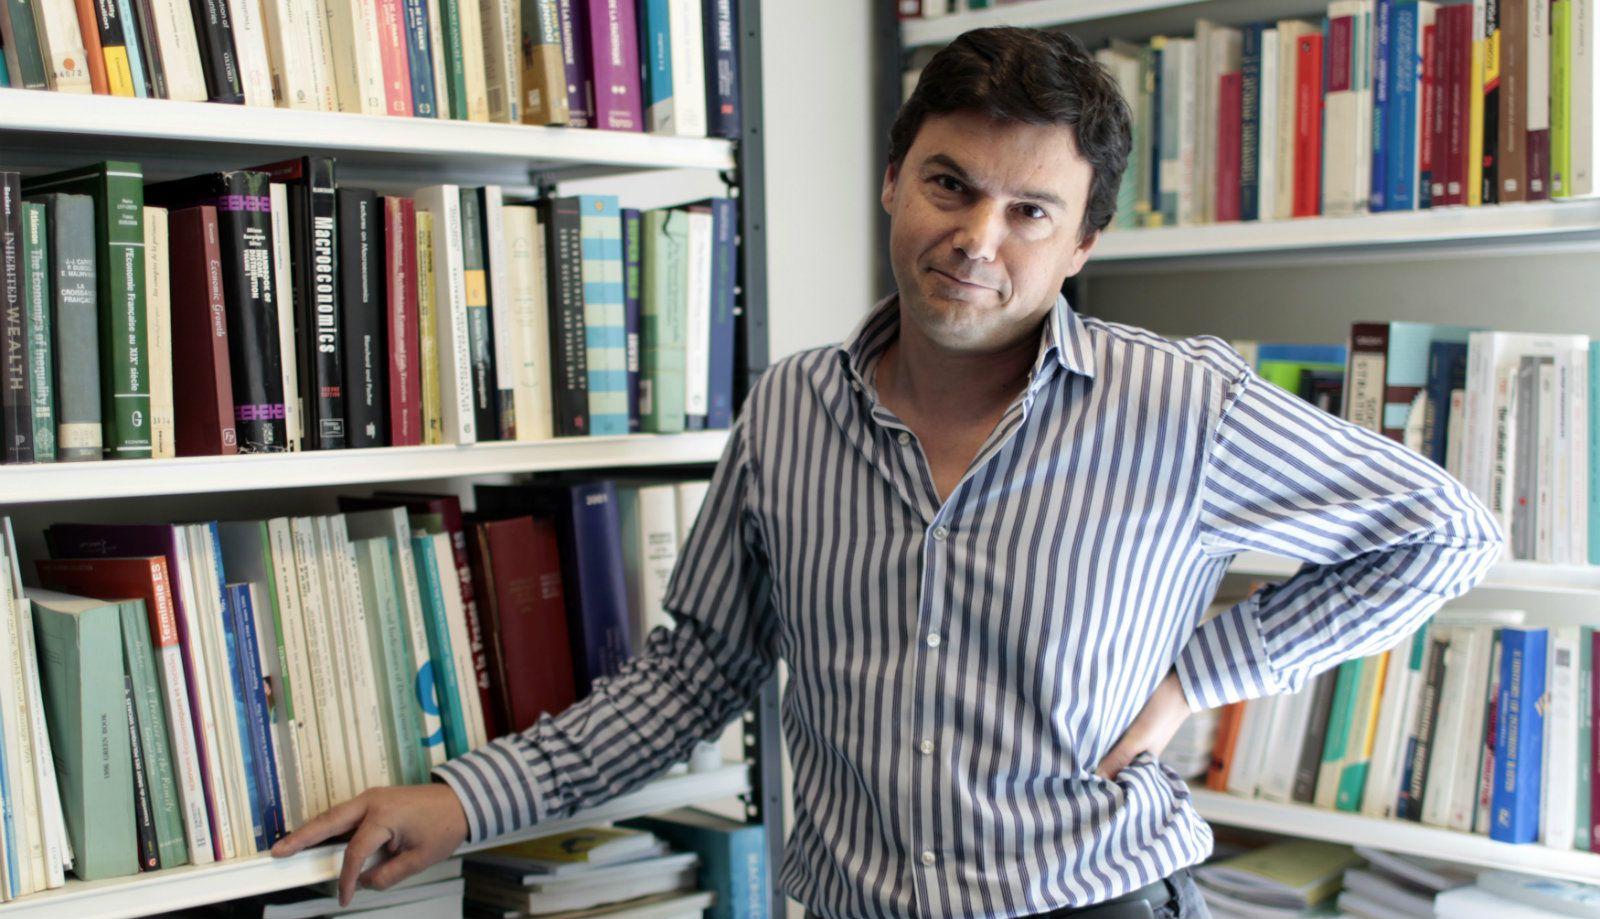 Economist Thomas Piketty